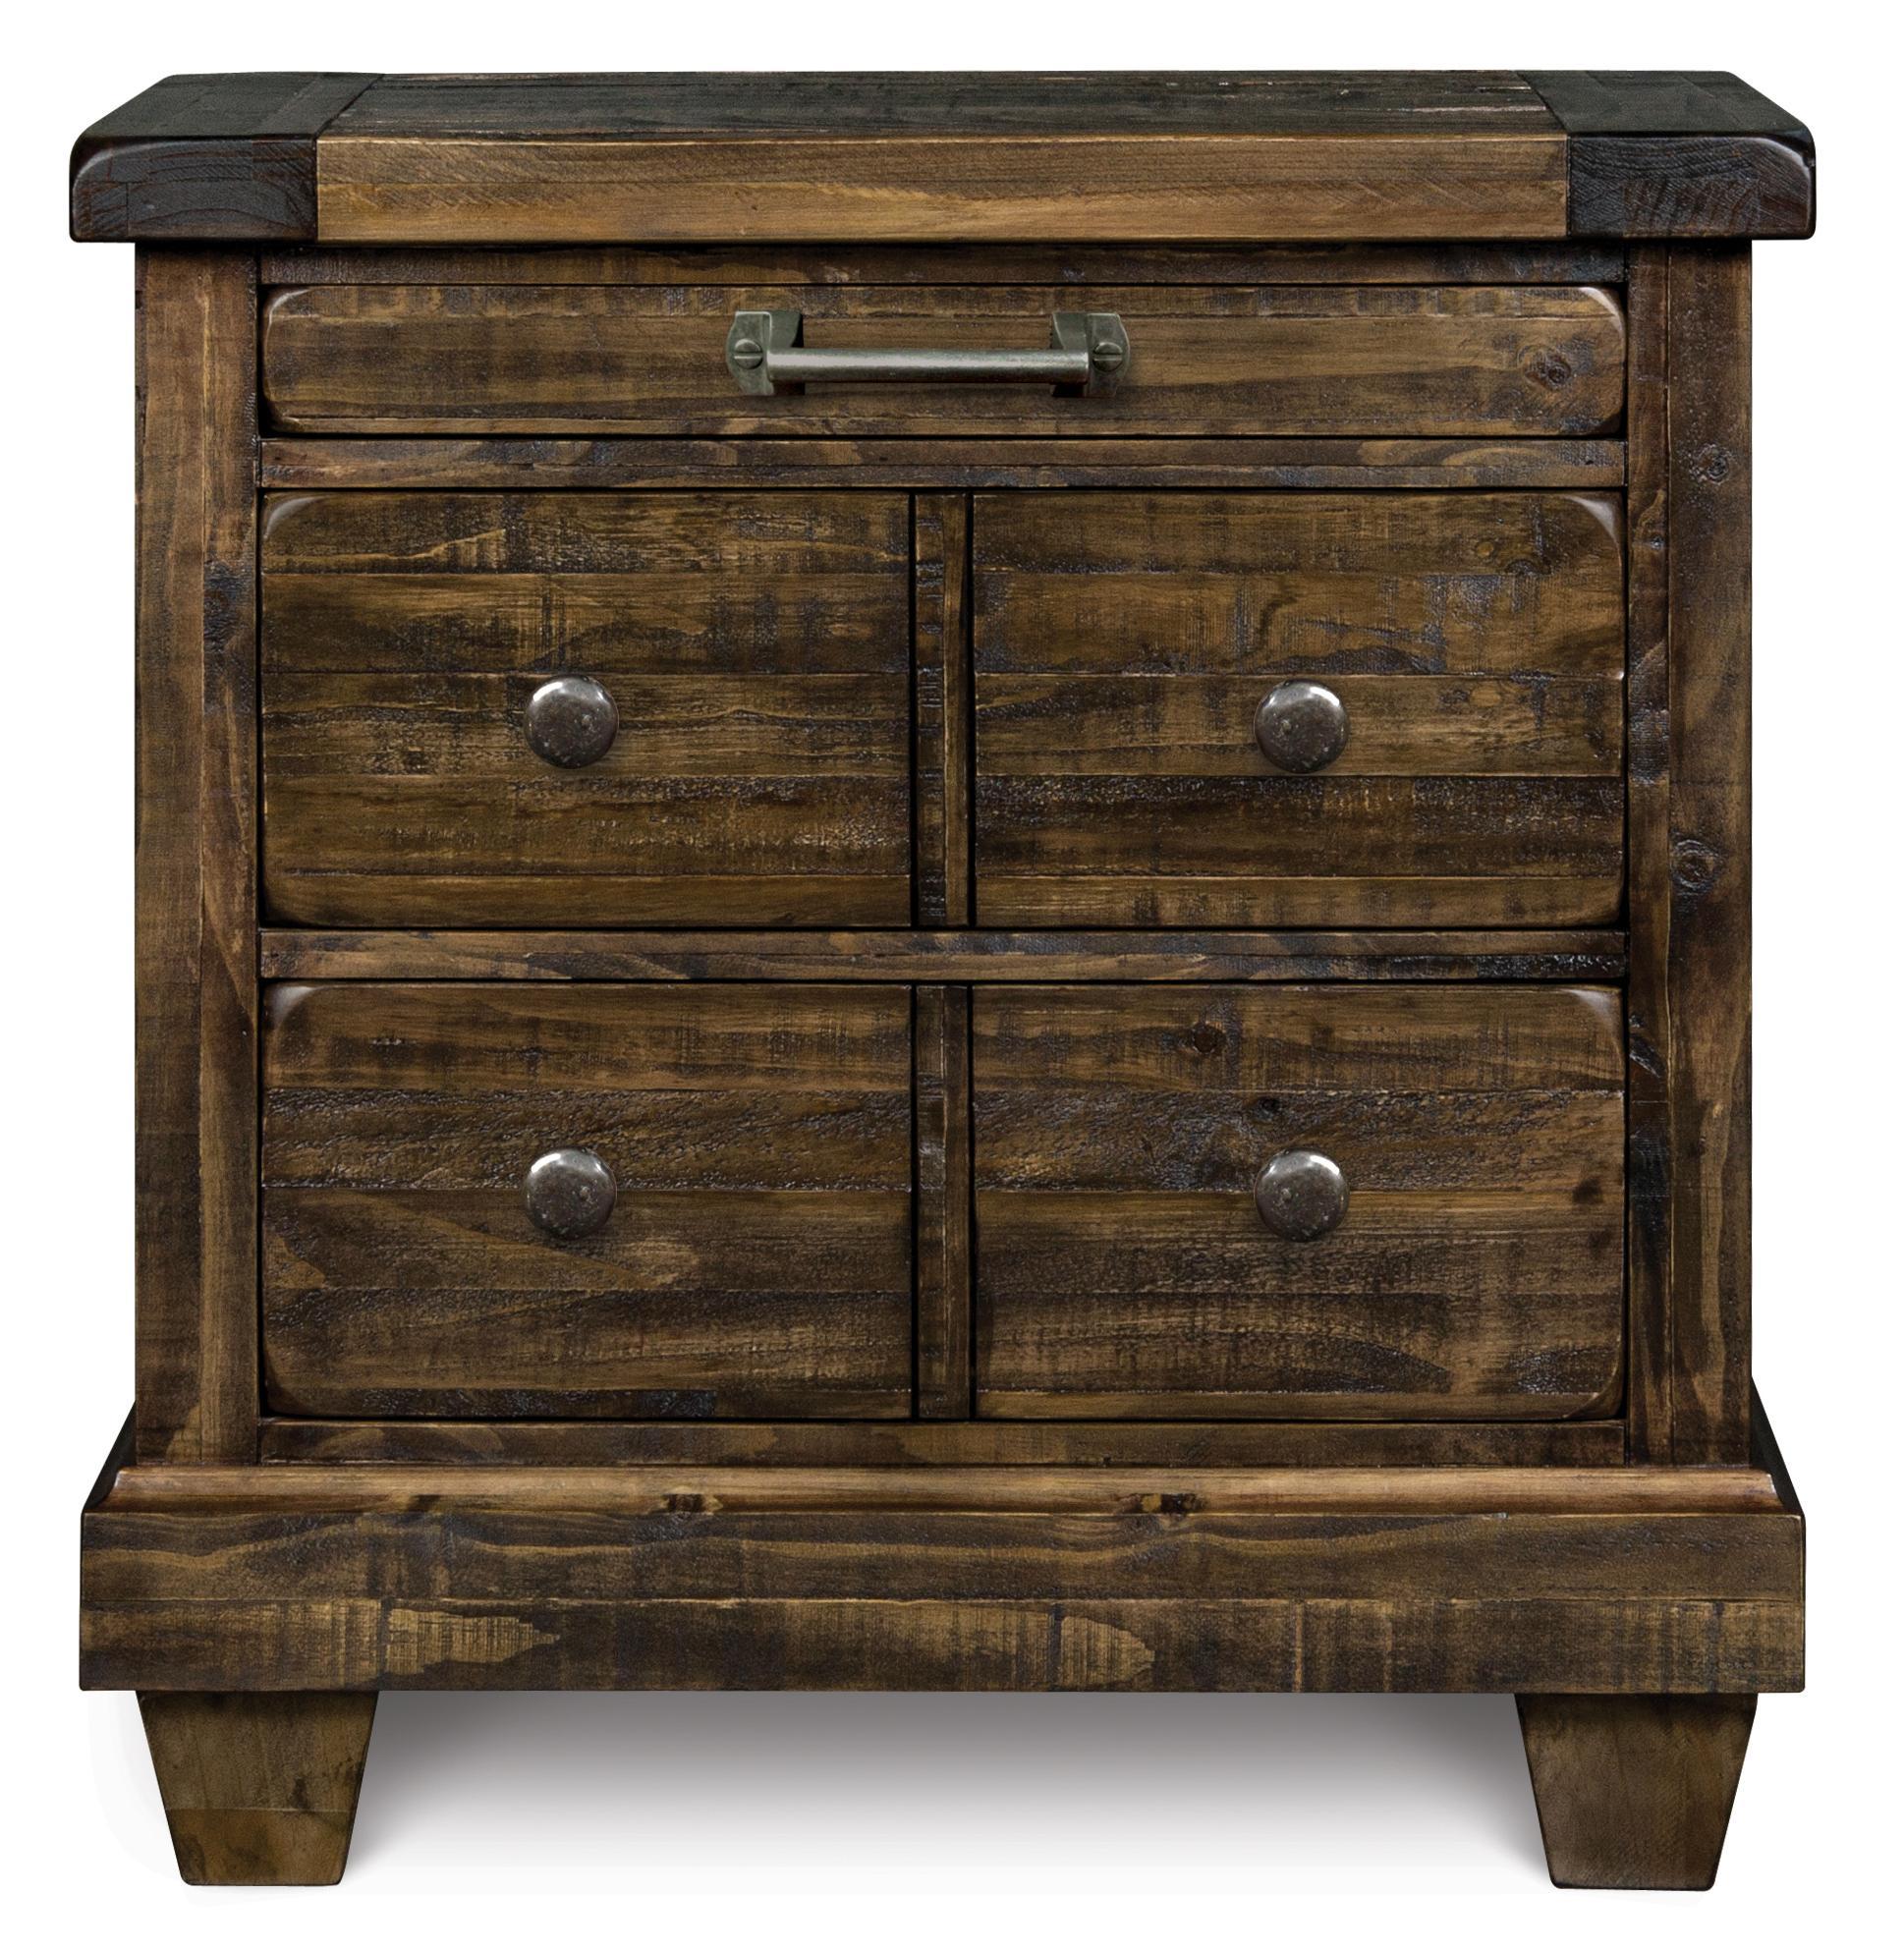 Magnussen Home  Brenley Drawer Nightstand - Item Number: B2524-01